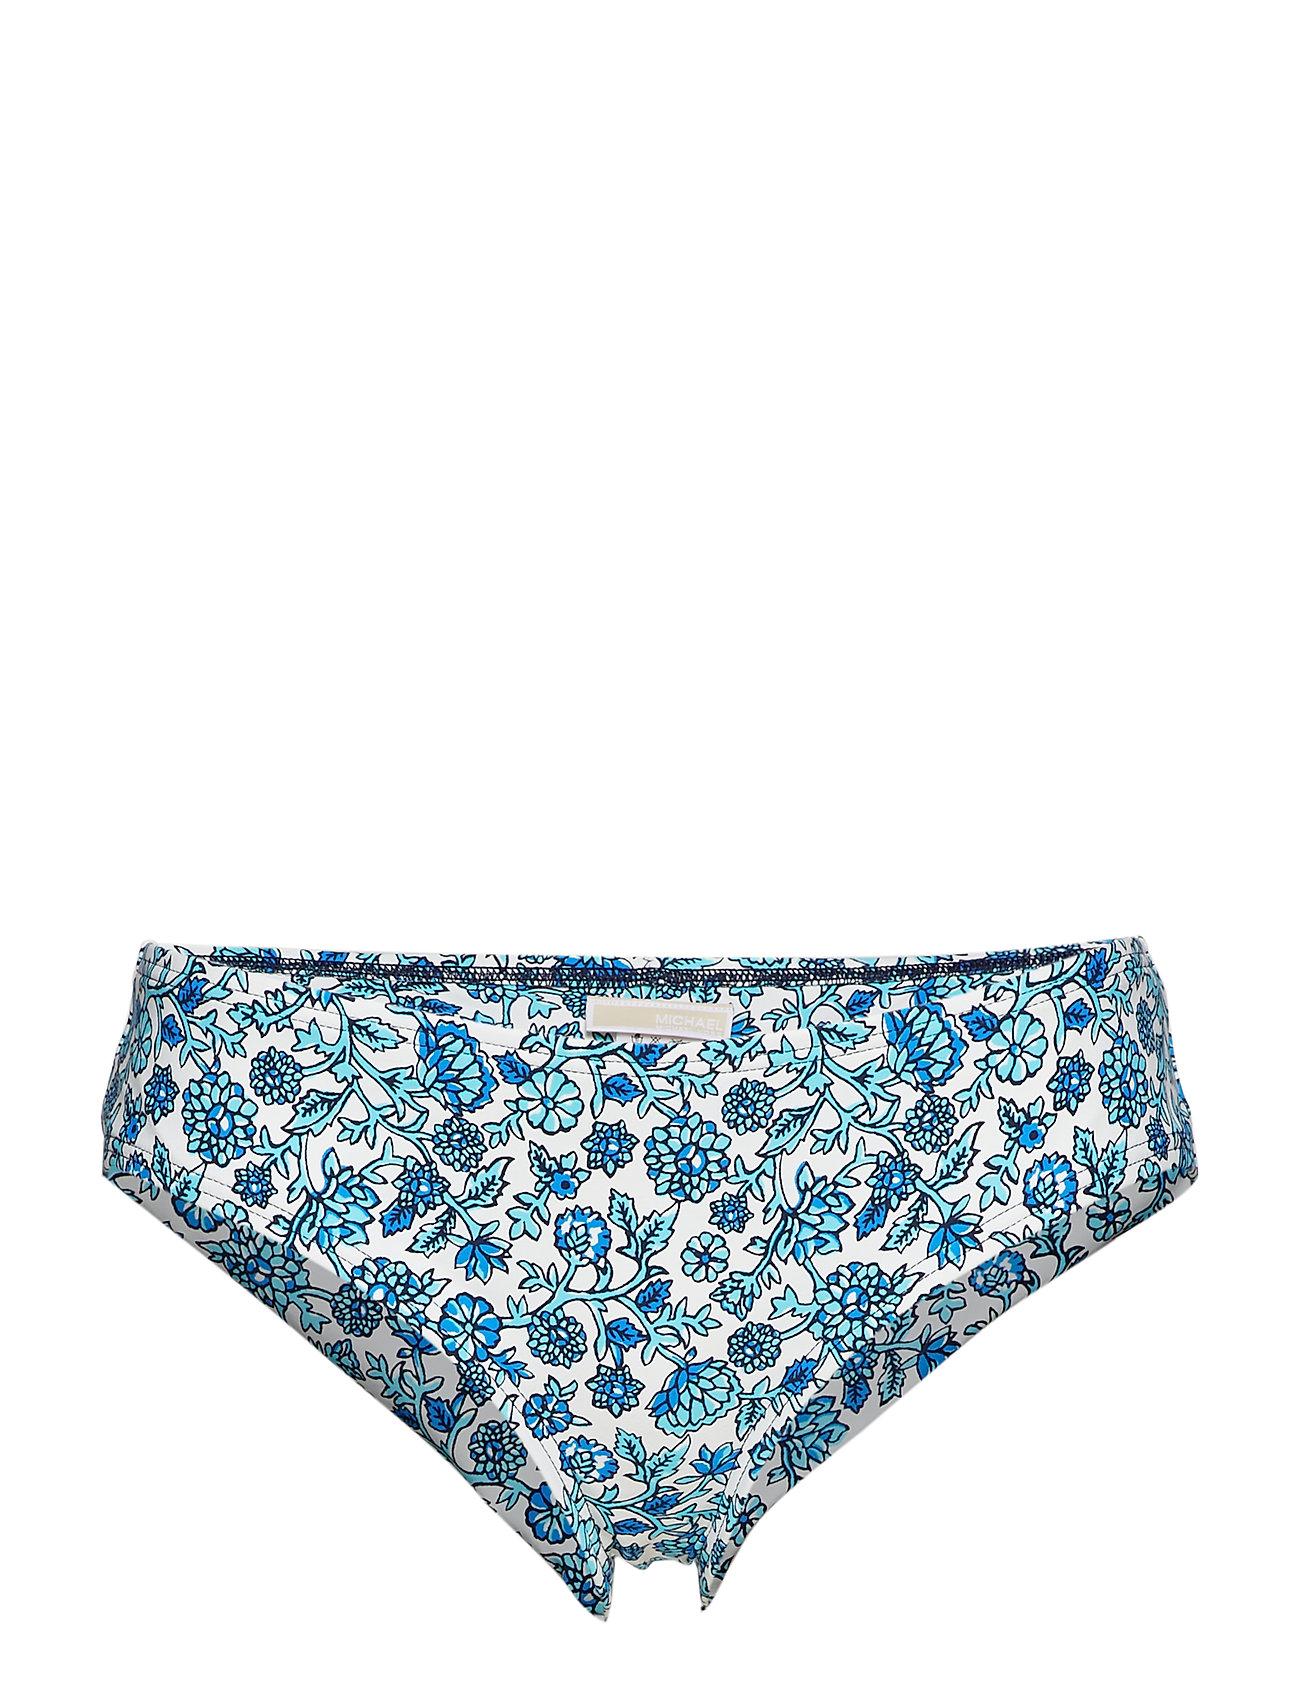 Michael Kors Swimwear SHIRRED BTM - RADIANT BLUE